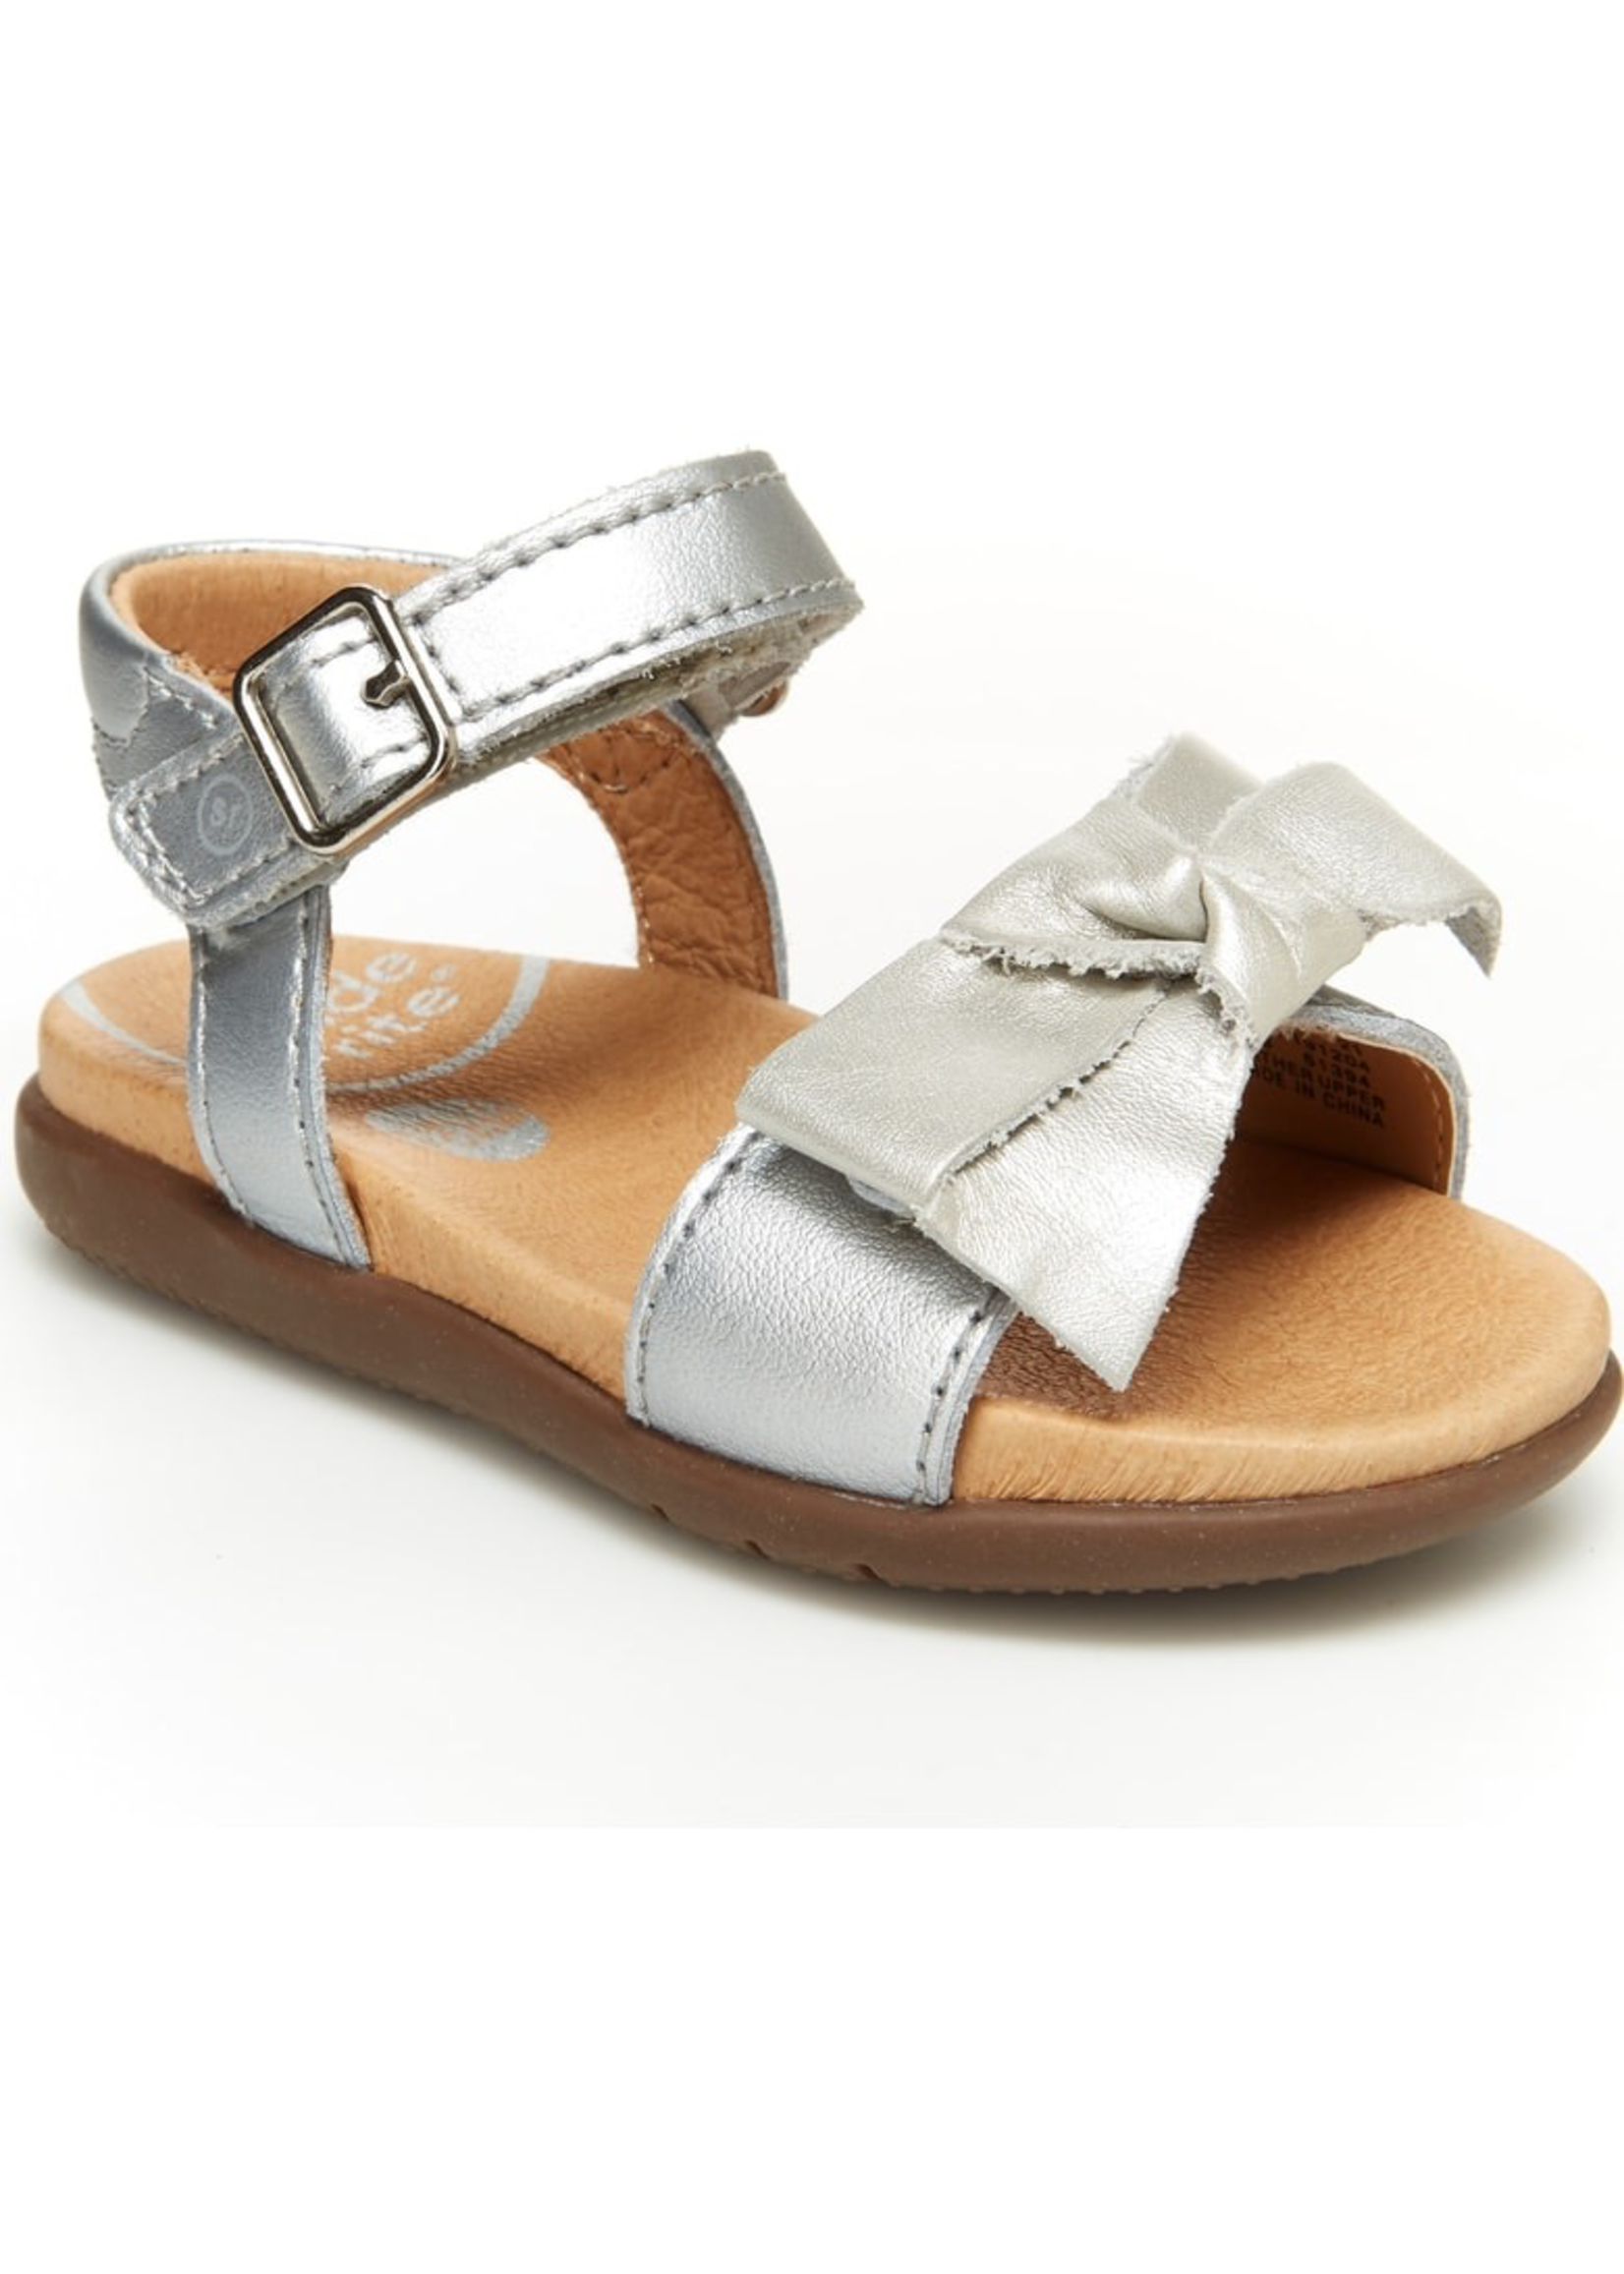 Striderite Stride Rite, Savannah sandal